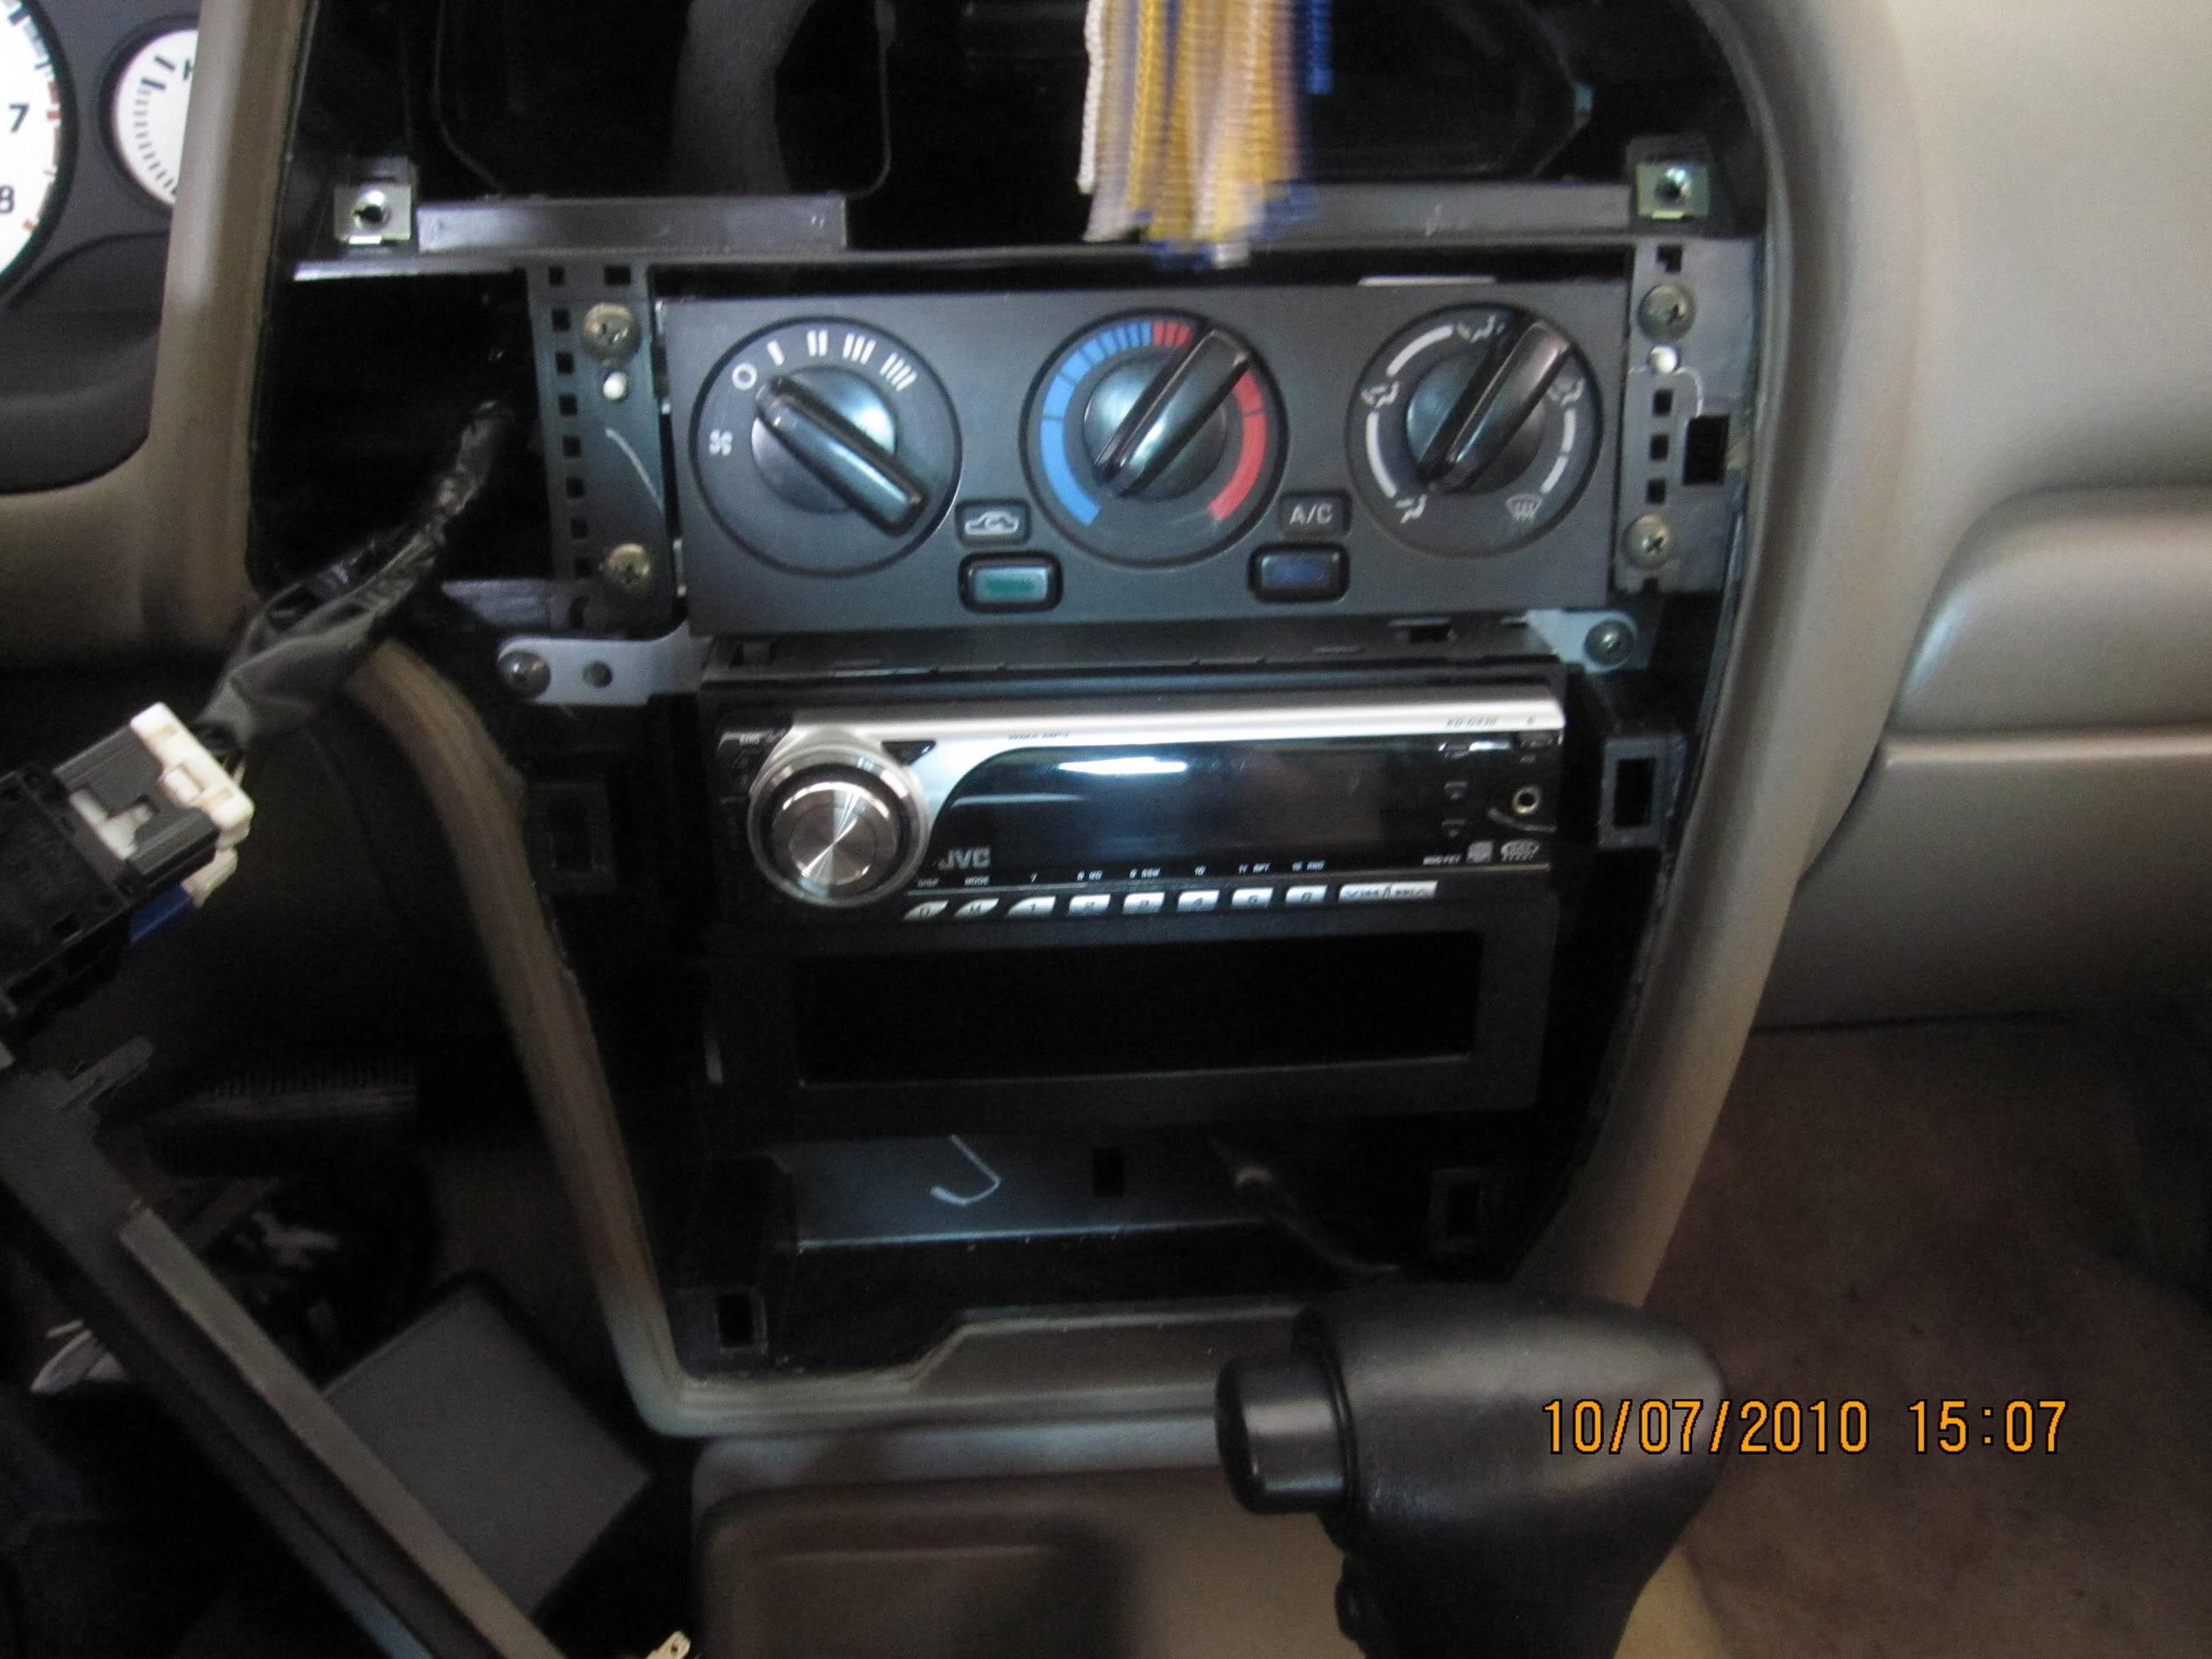 Nissan Pathfinder radio removal